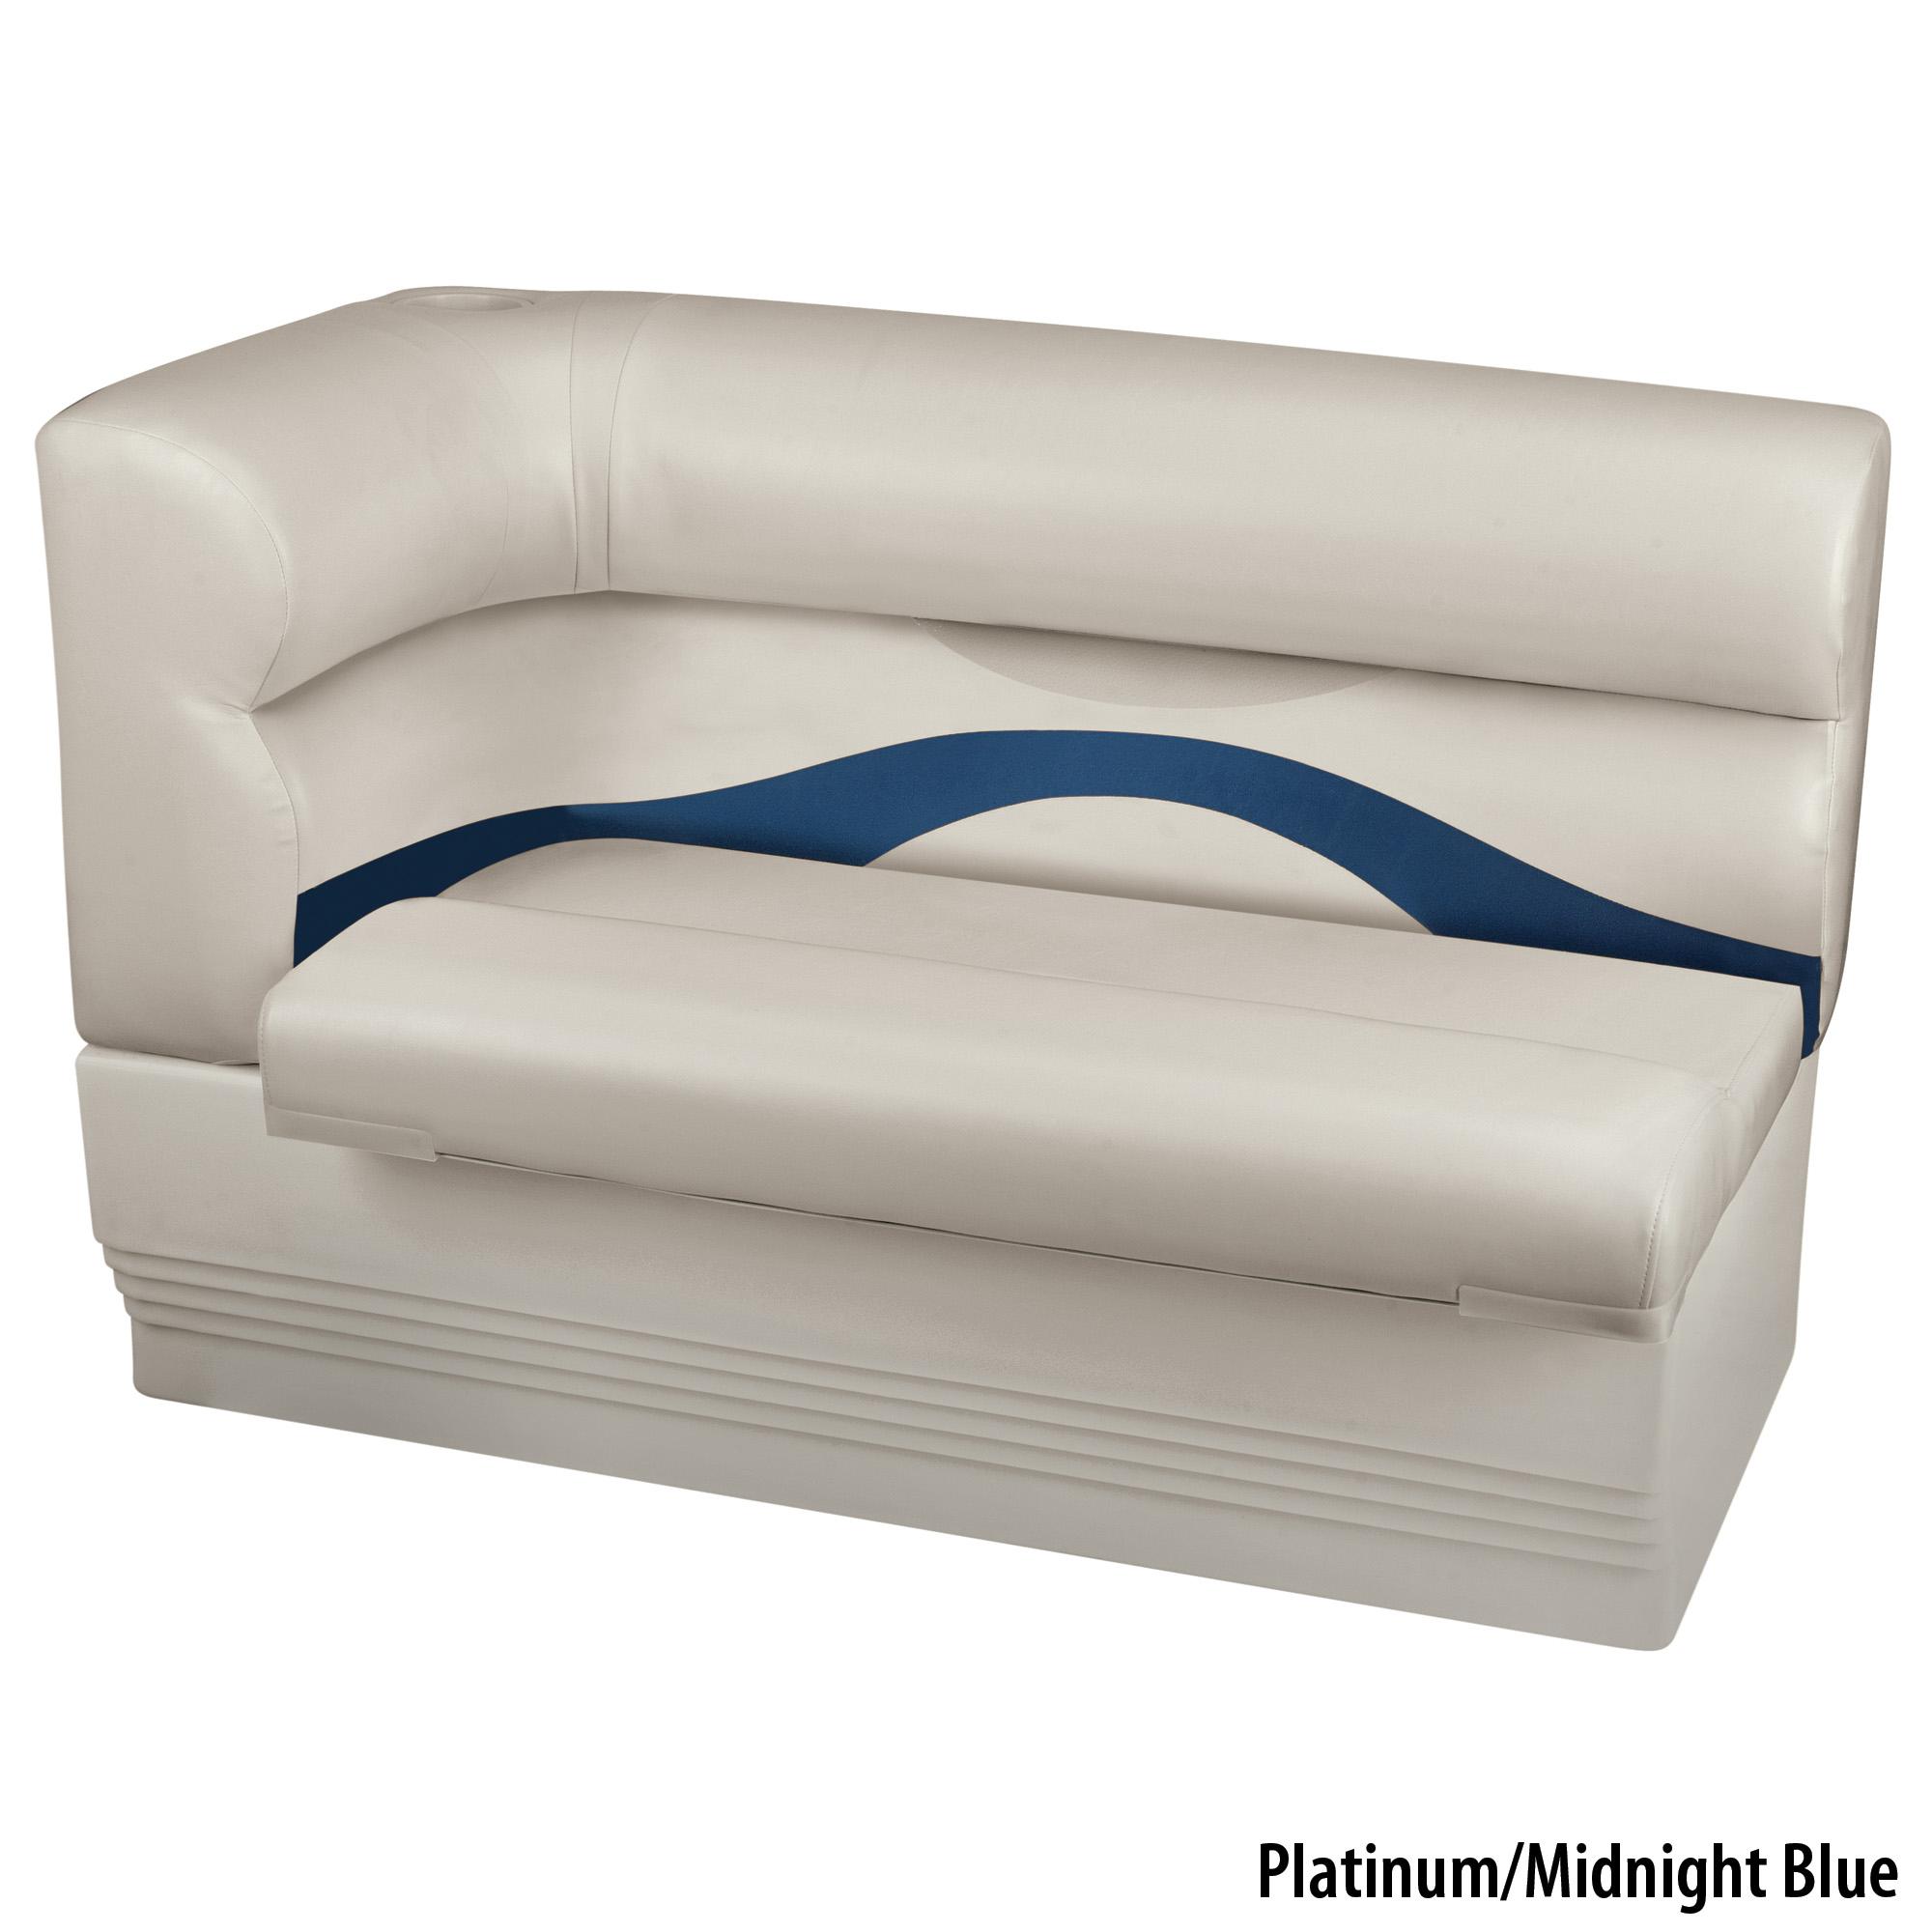 Toonmate Premium Pontoon Right-Side Corner Couch w/Platinum Base